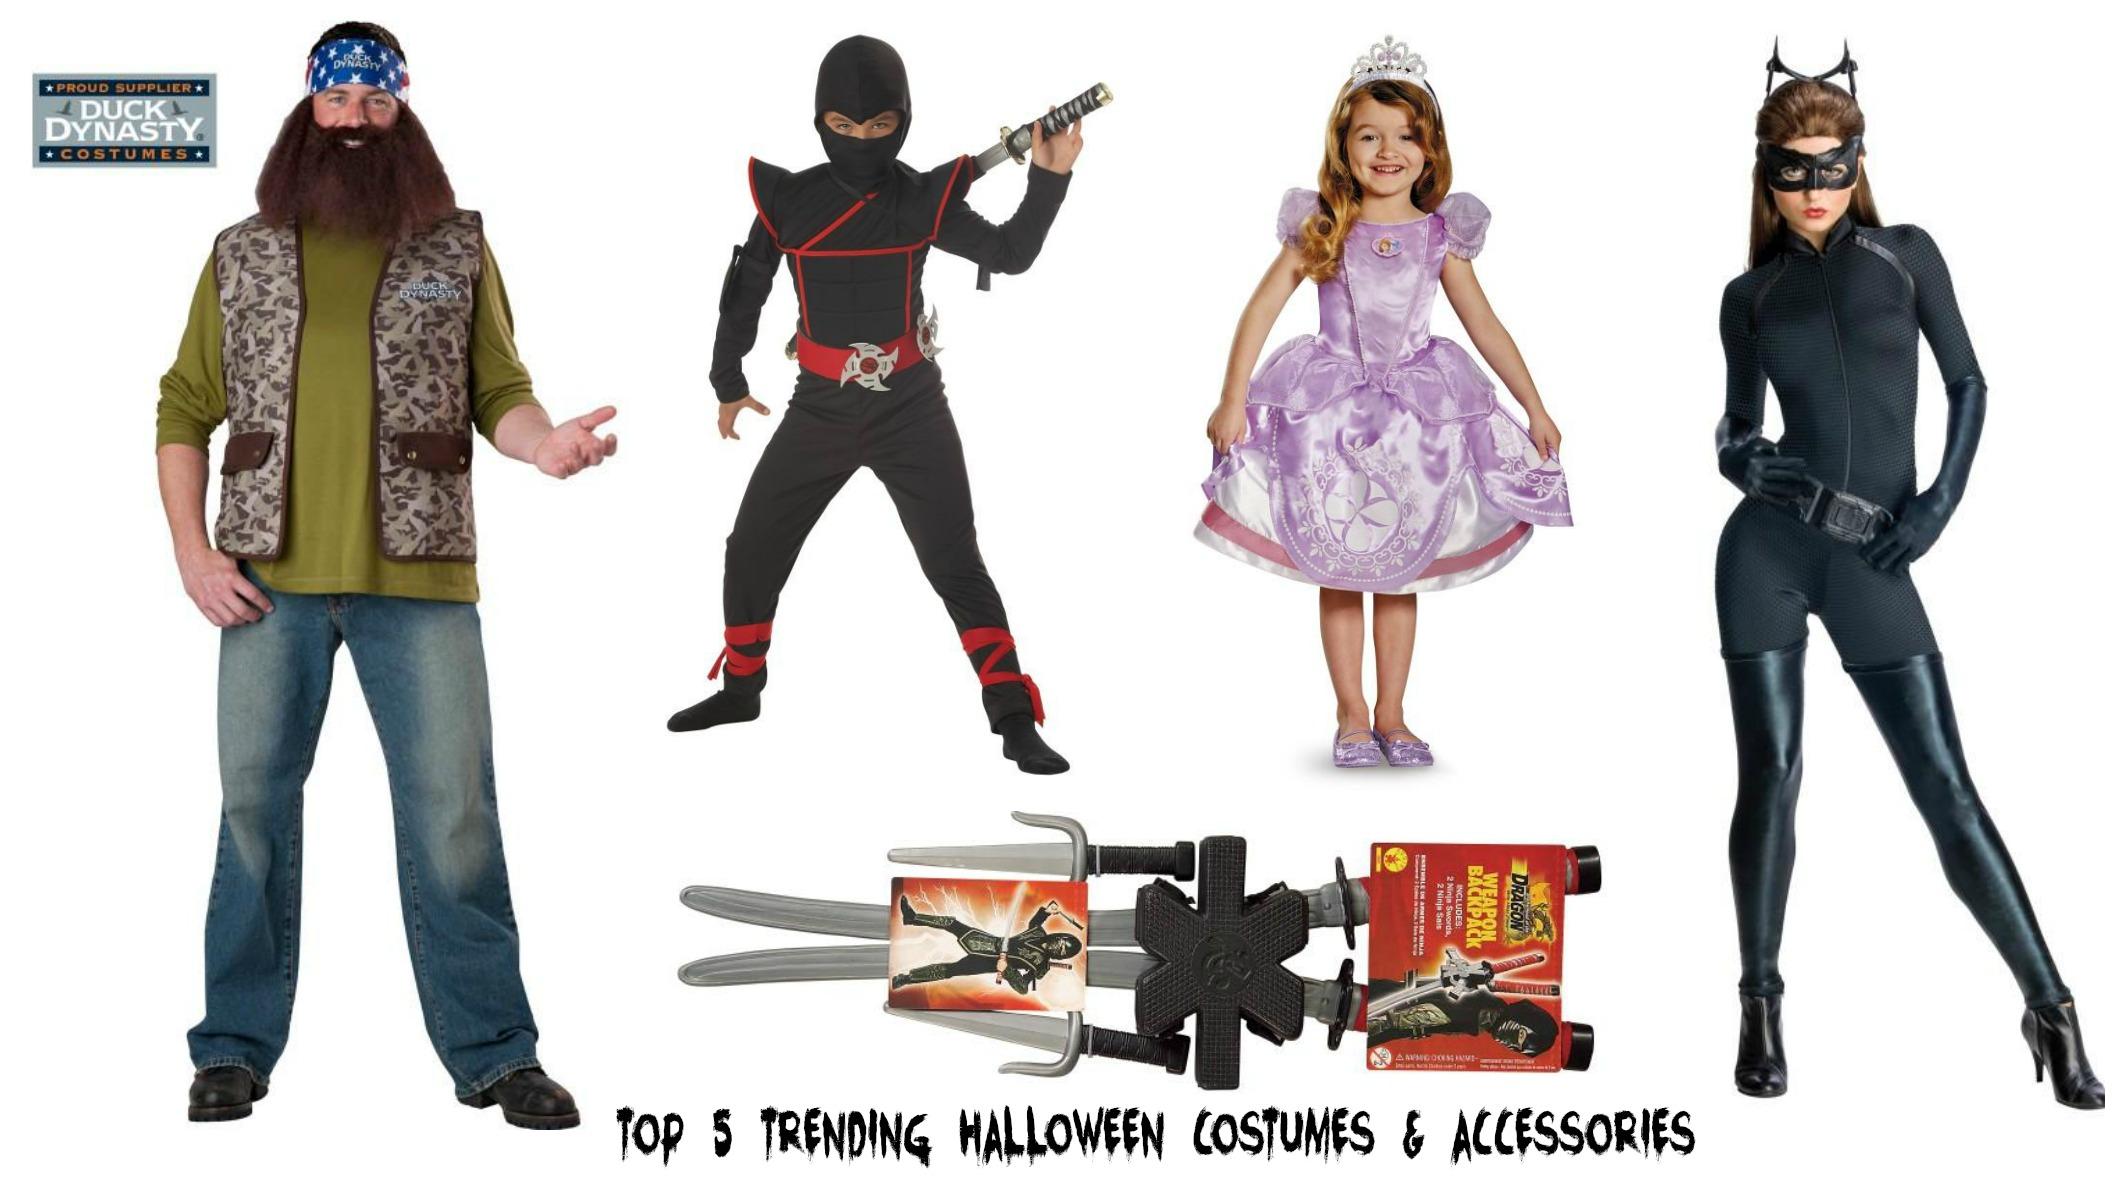 Top 5 Trending Halloween Costumes and Accessories